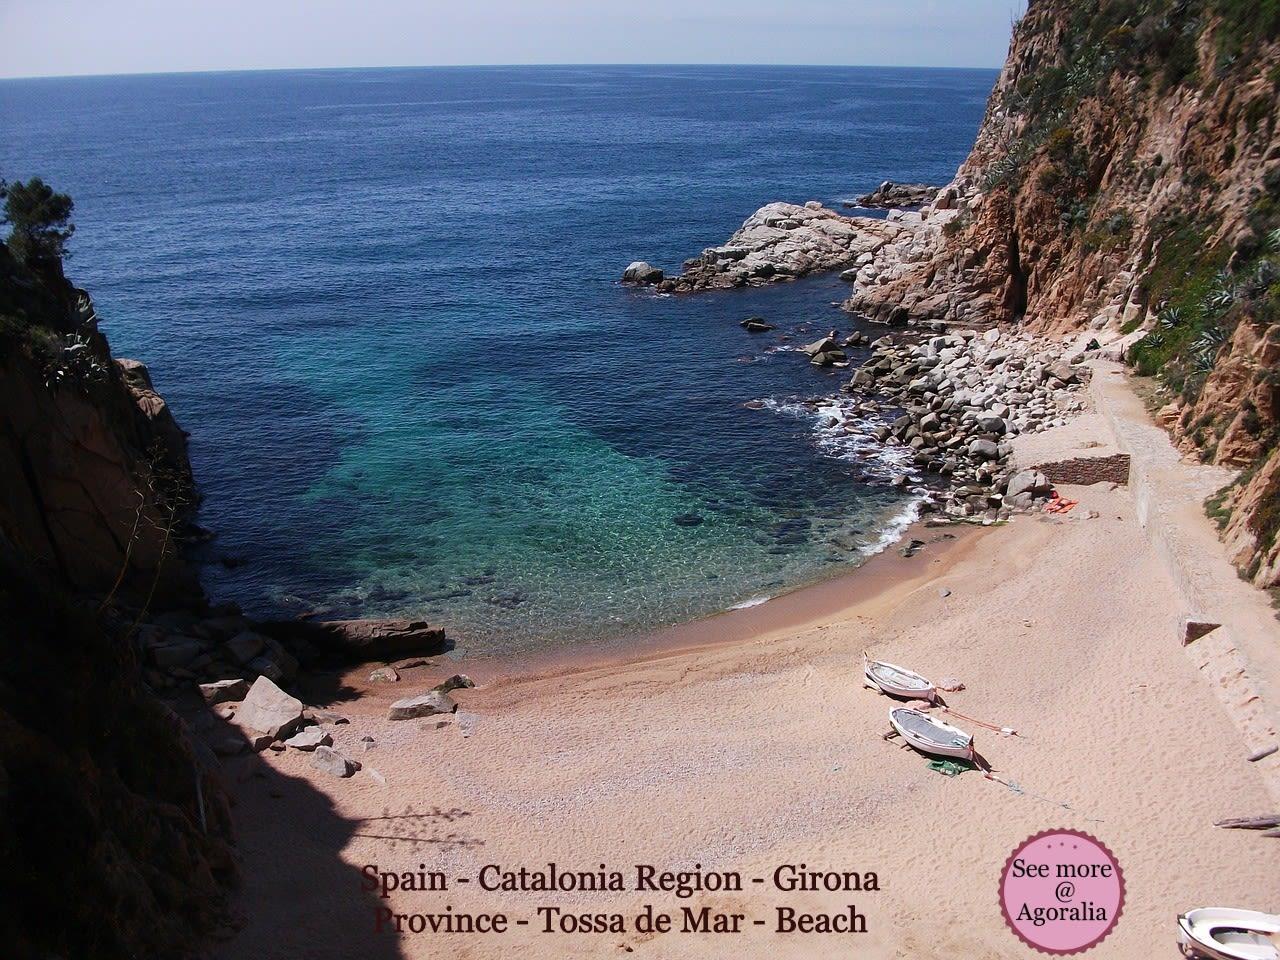 Spain-Catalonia-Region-Girona-Province-Tossa-de-Mar-Beach